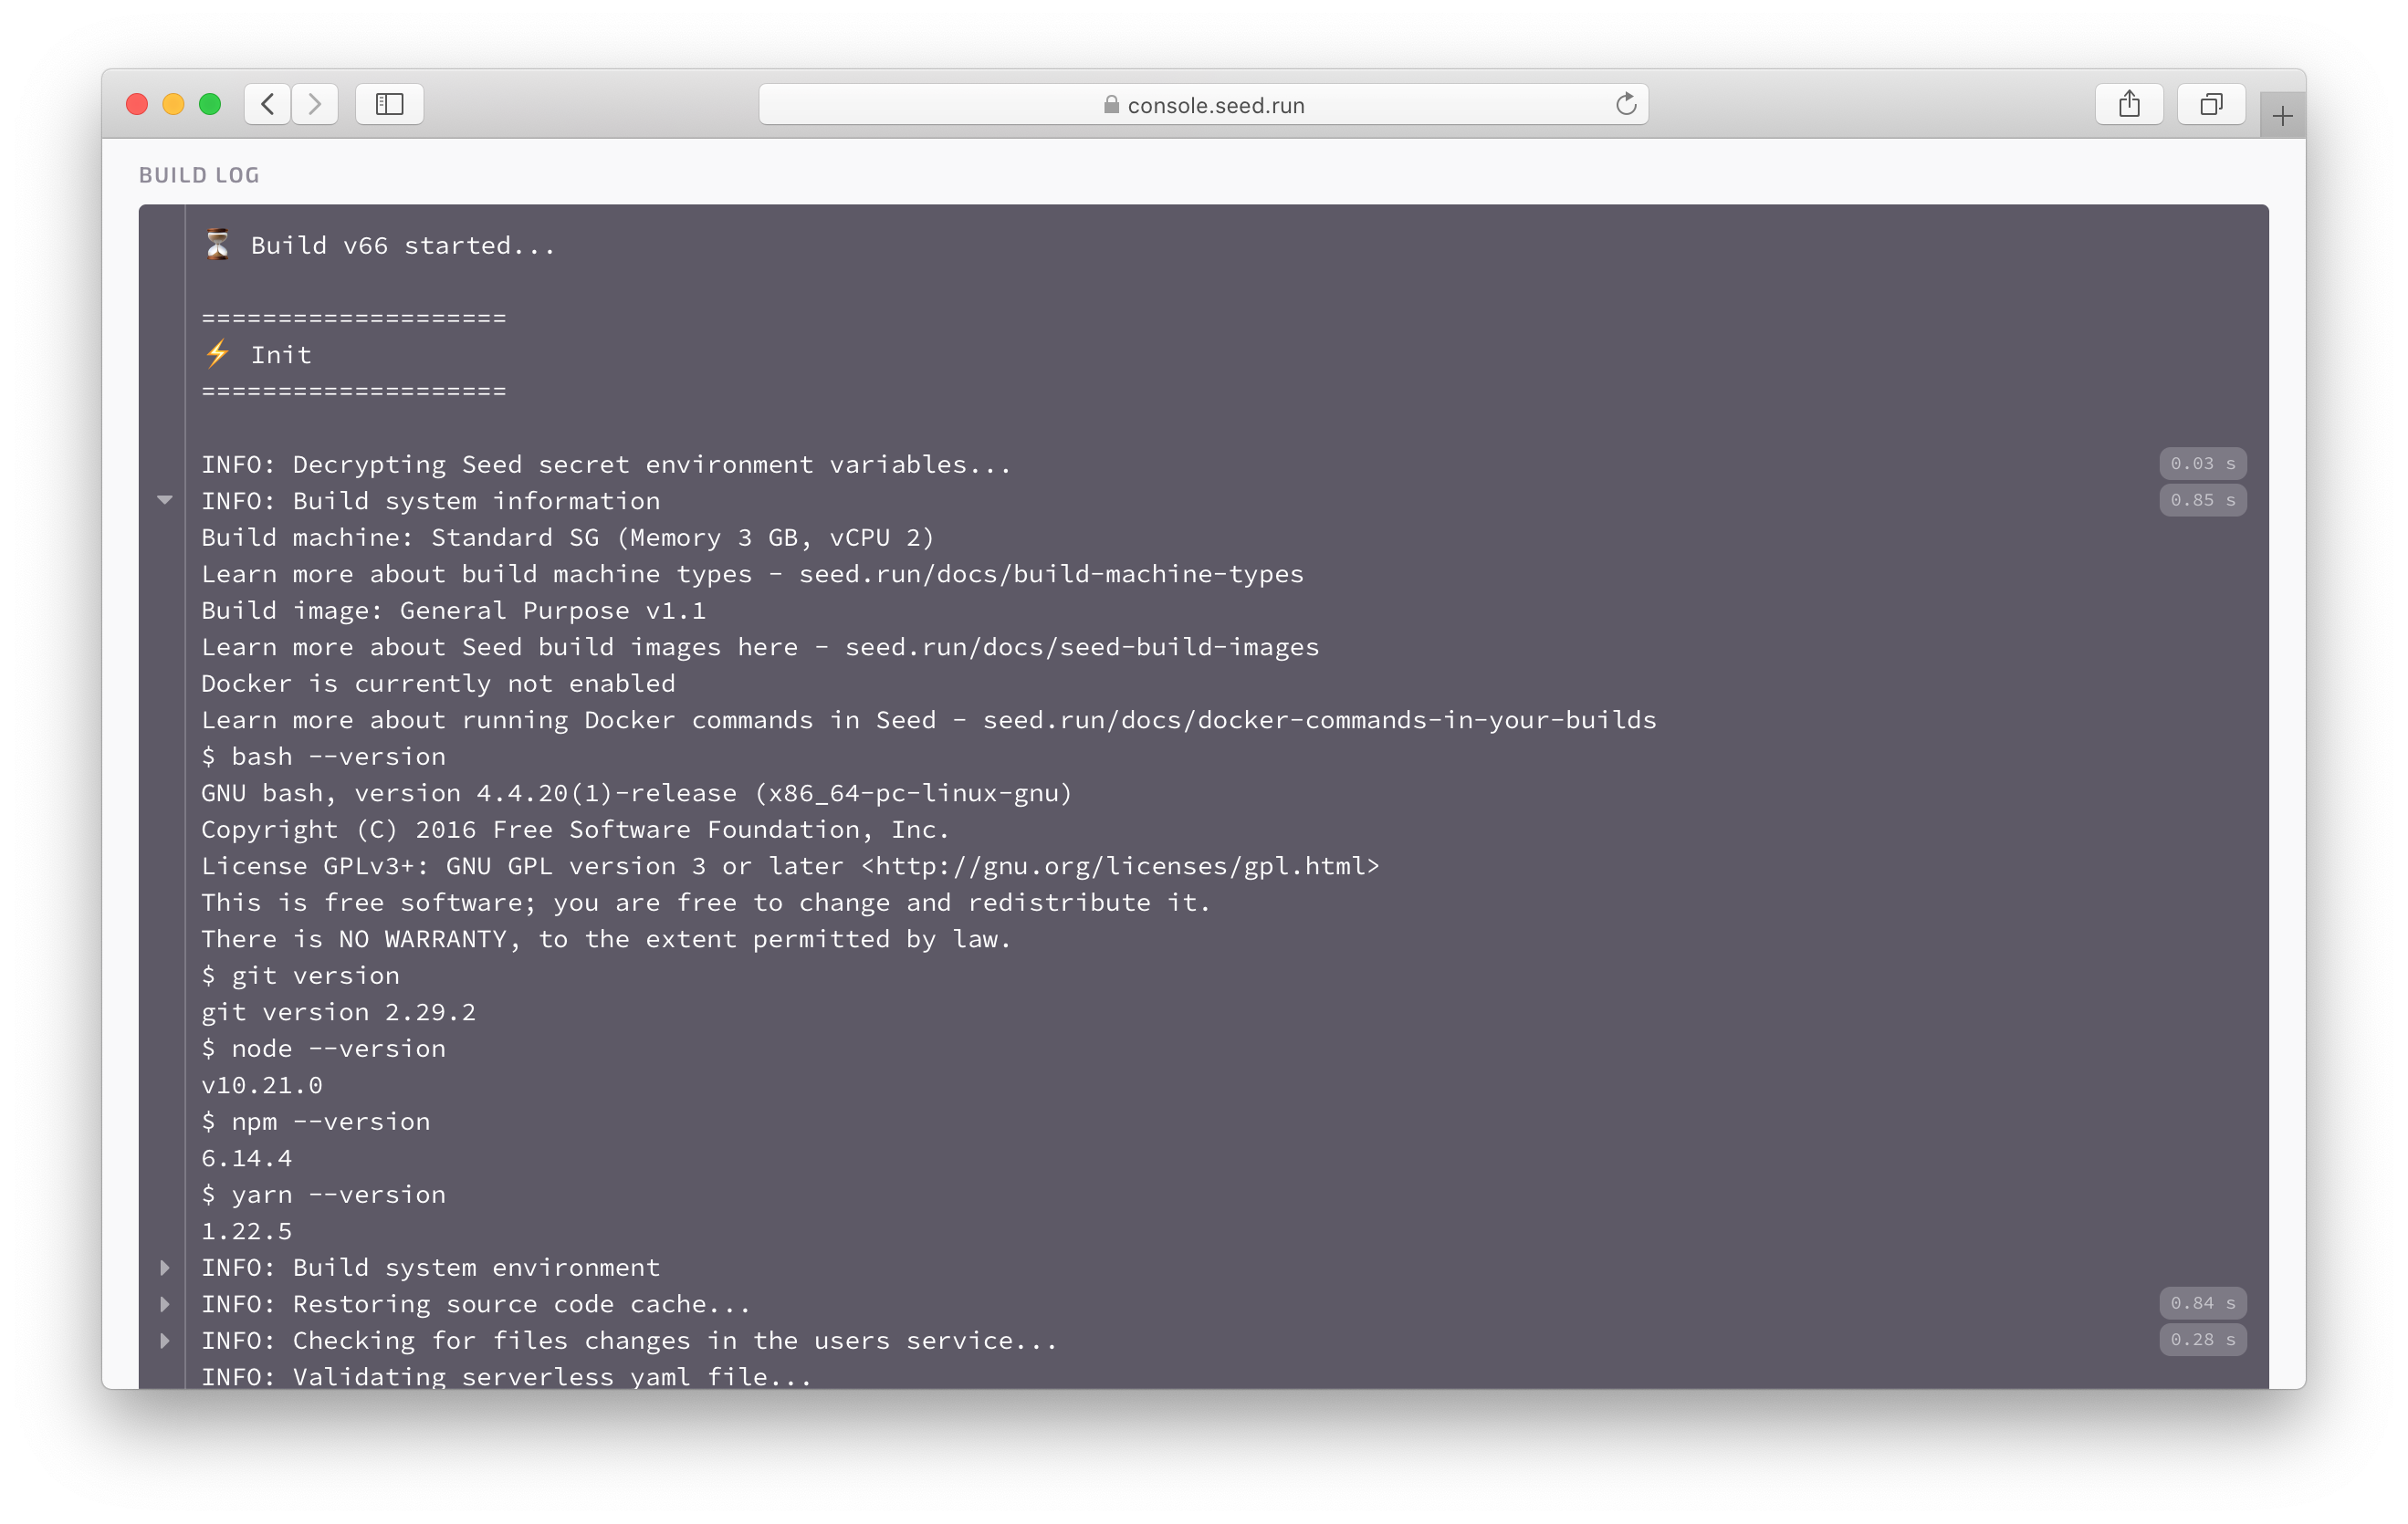 Build machine info in build log